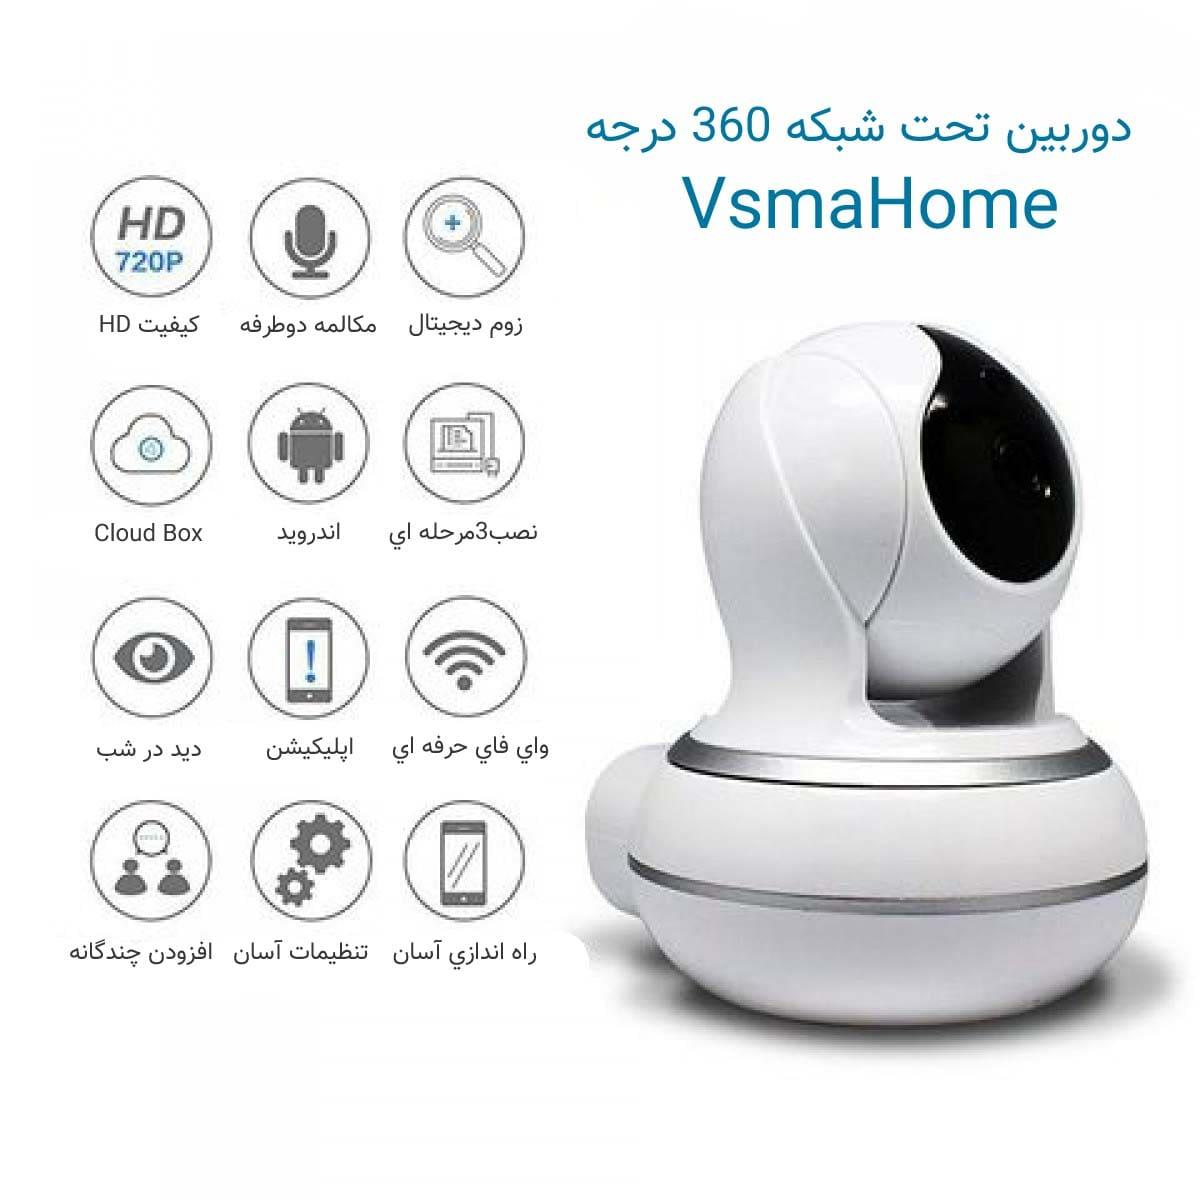 دوربین تحت شبکه Vsmahome